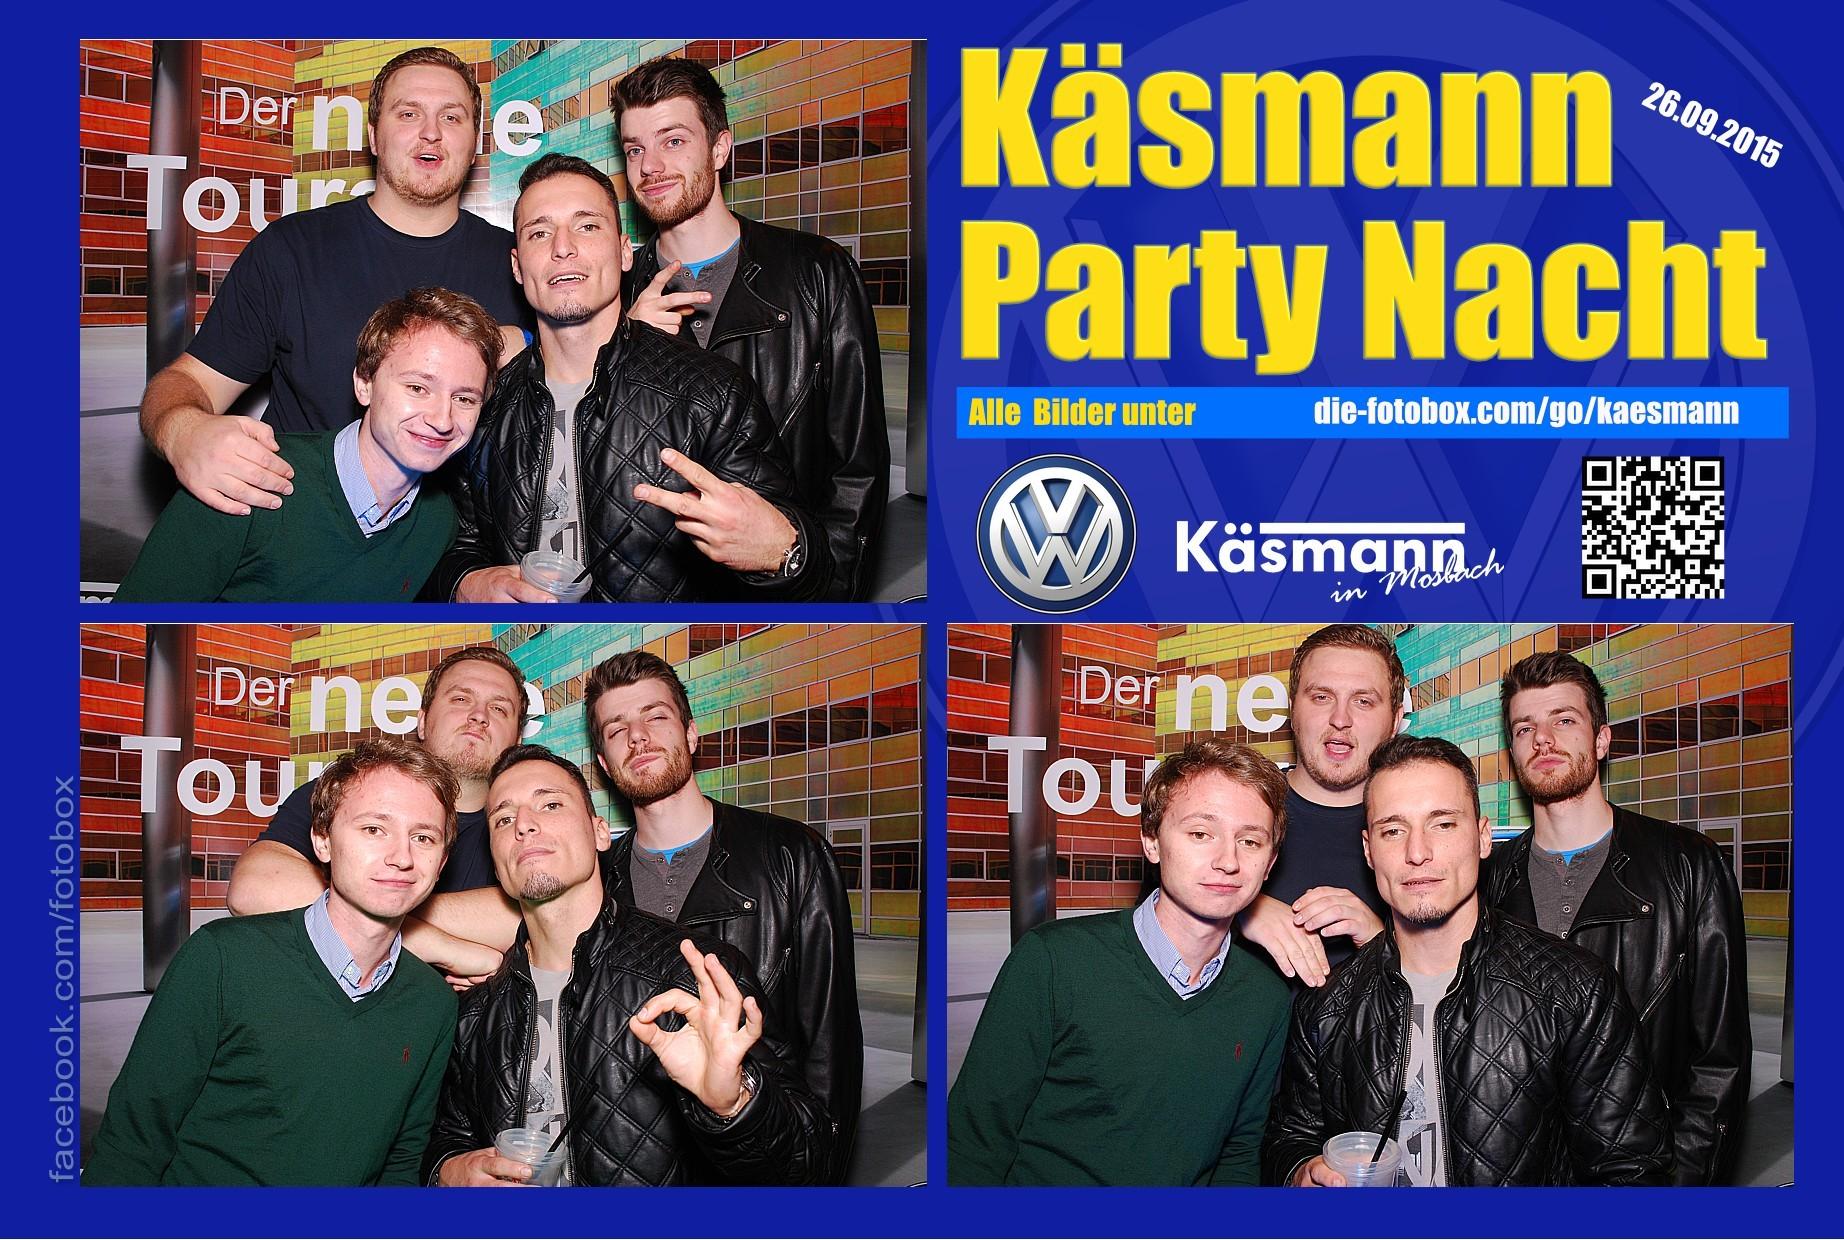 Käsmannparty 2015 - www.die-fotobox.com 01056